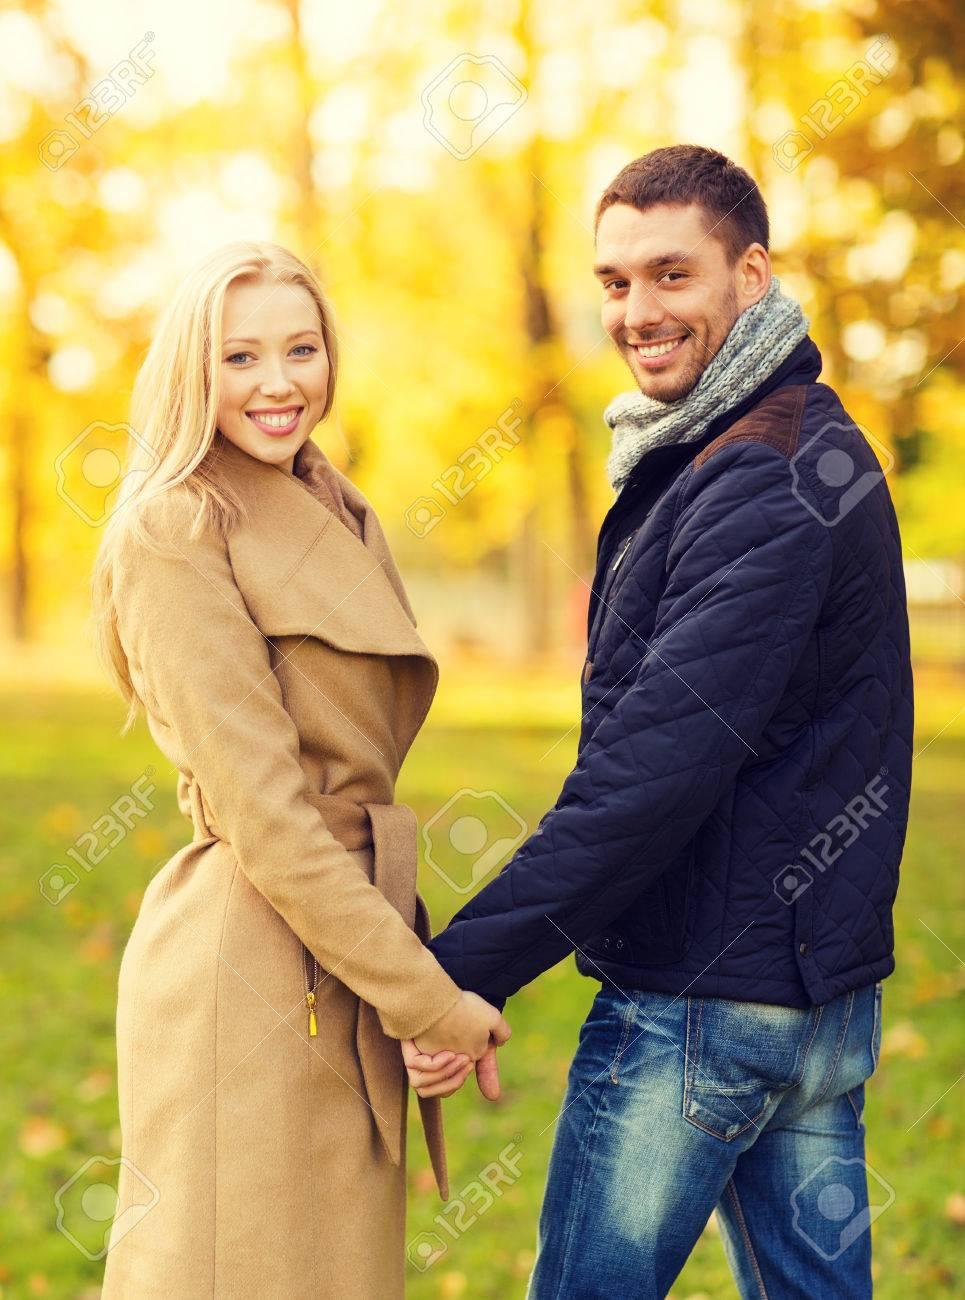 tourism dating